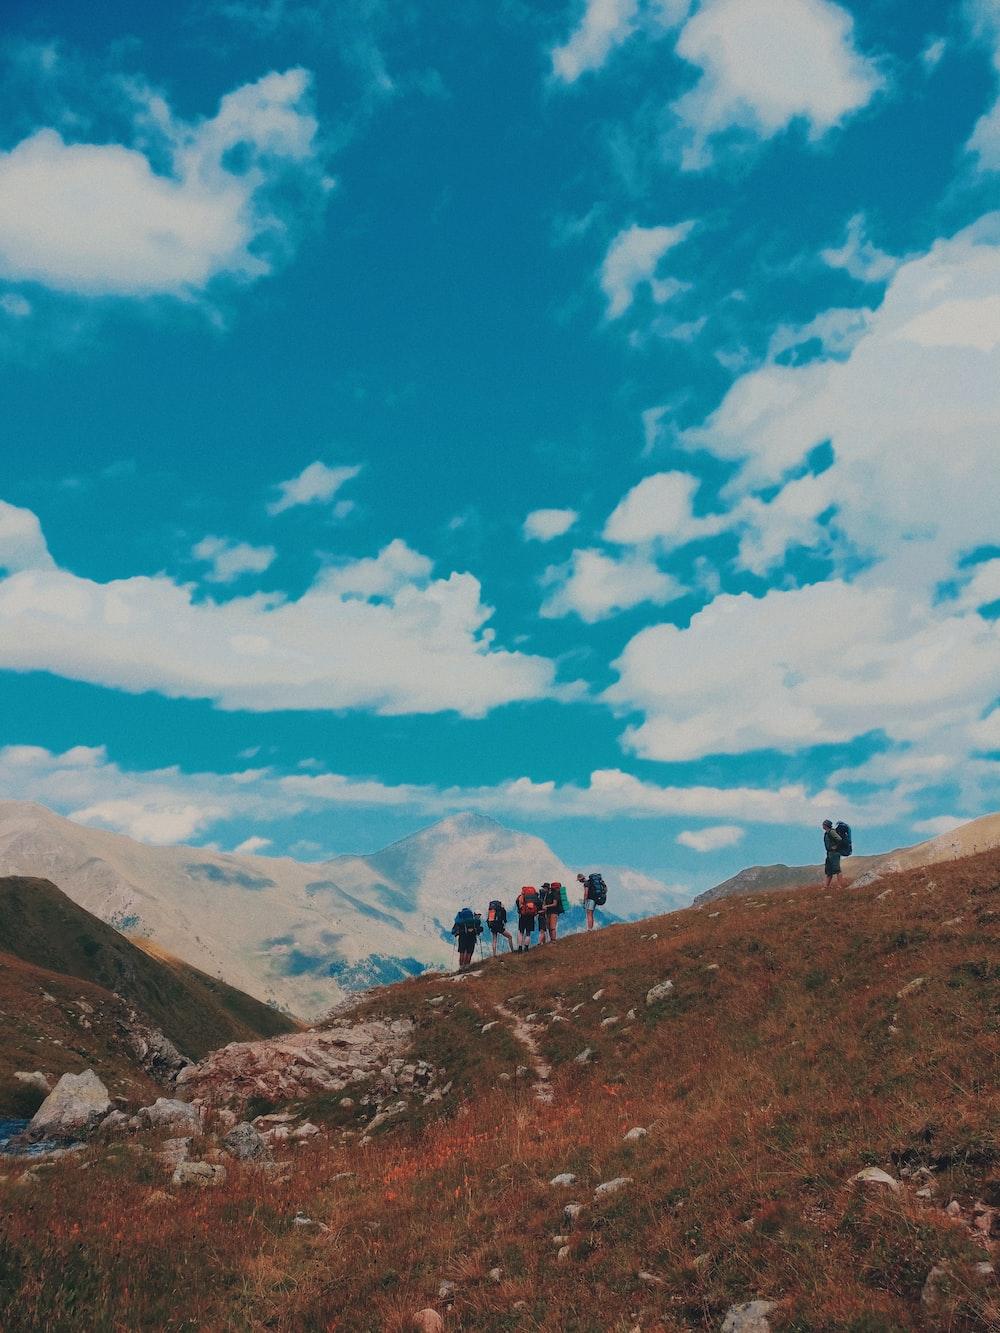 group of people standing on mountain range